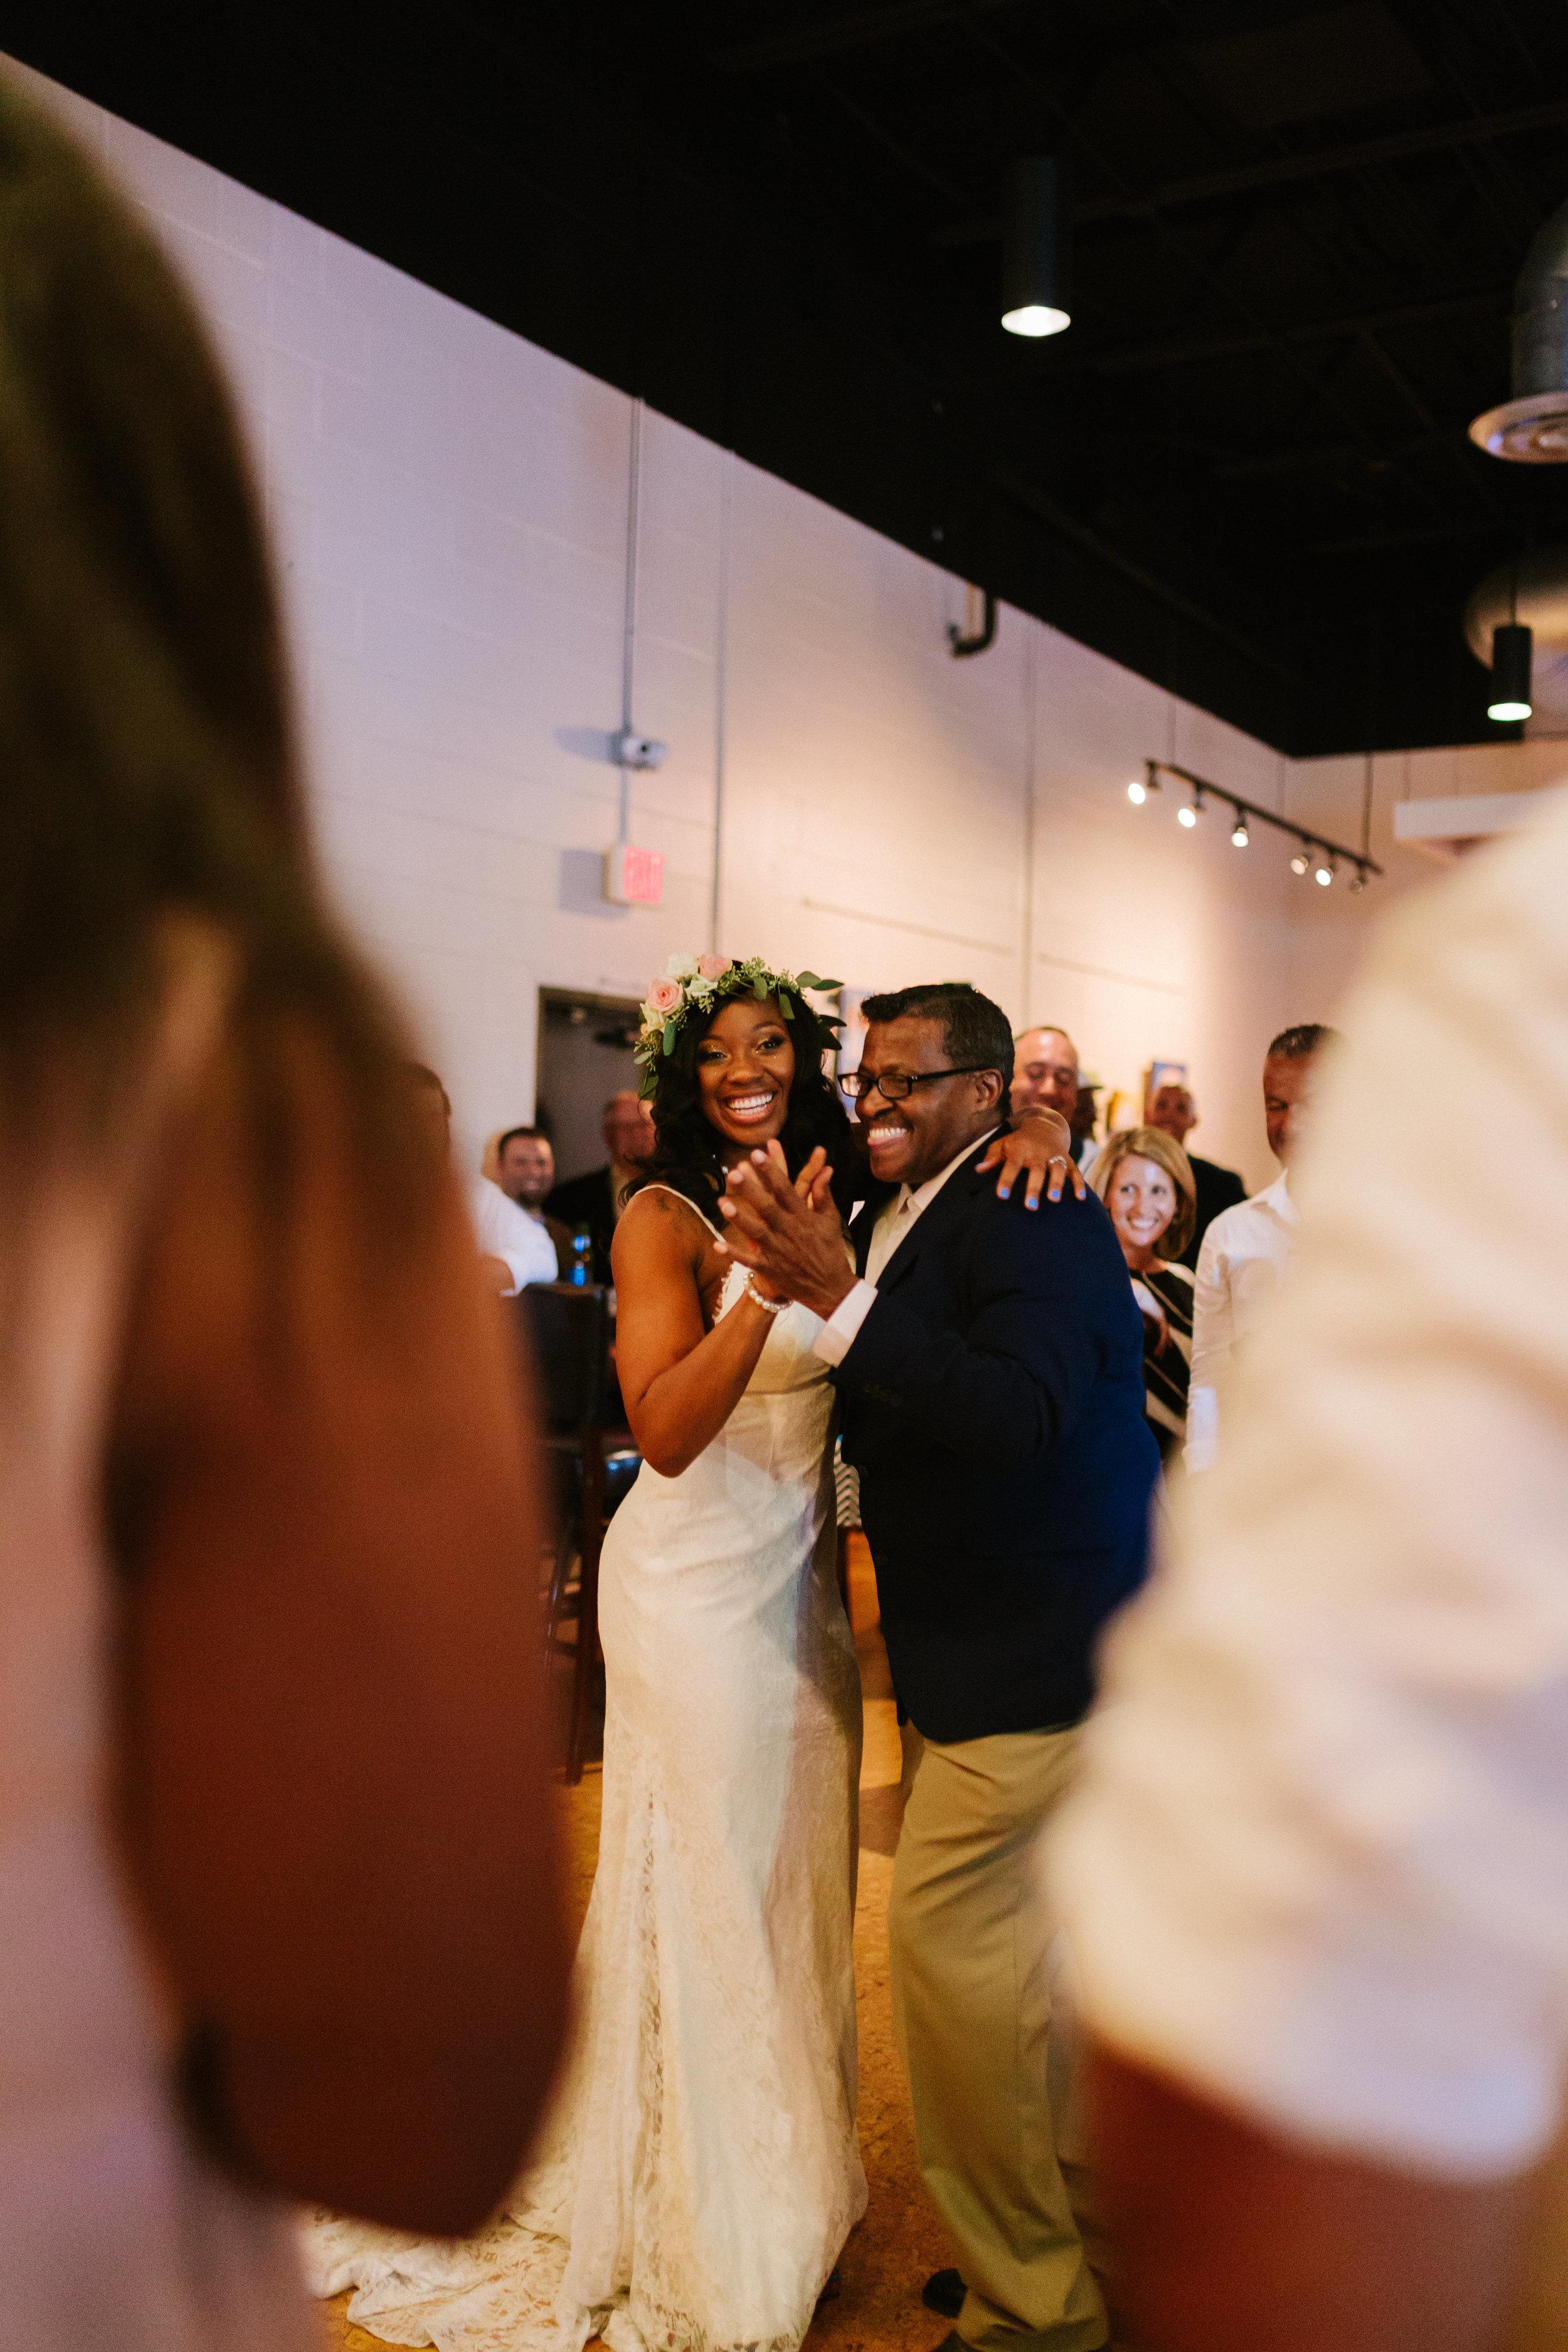 2017.09.16 Ashley and Chuck O'Day Quantam Leap Winery Wedding (335 of 462).jpg